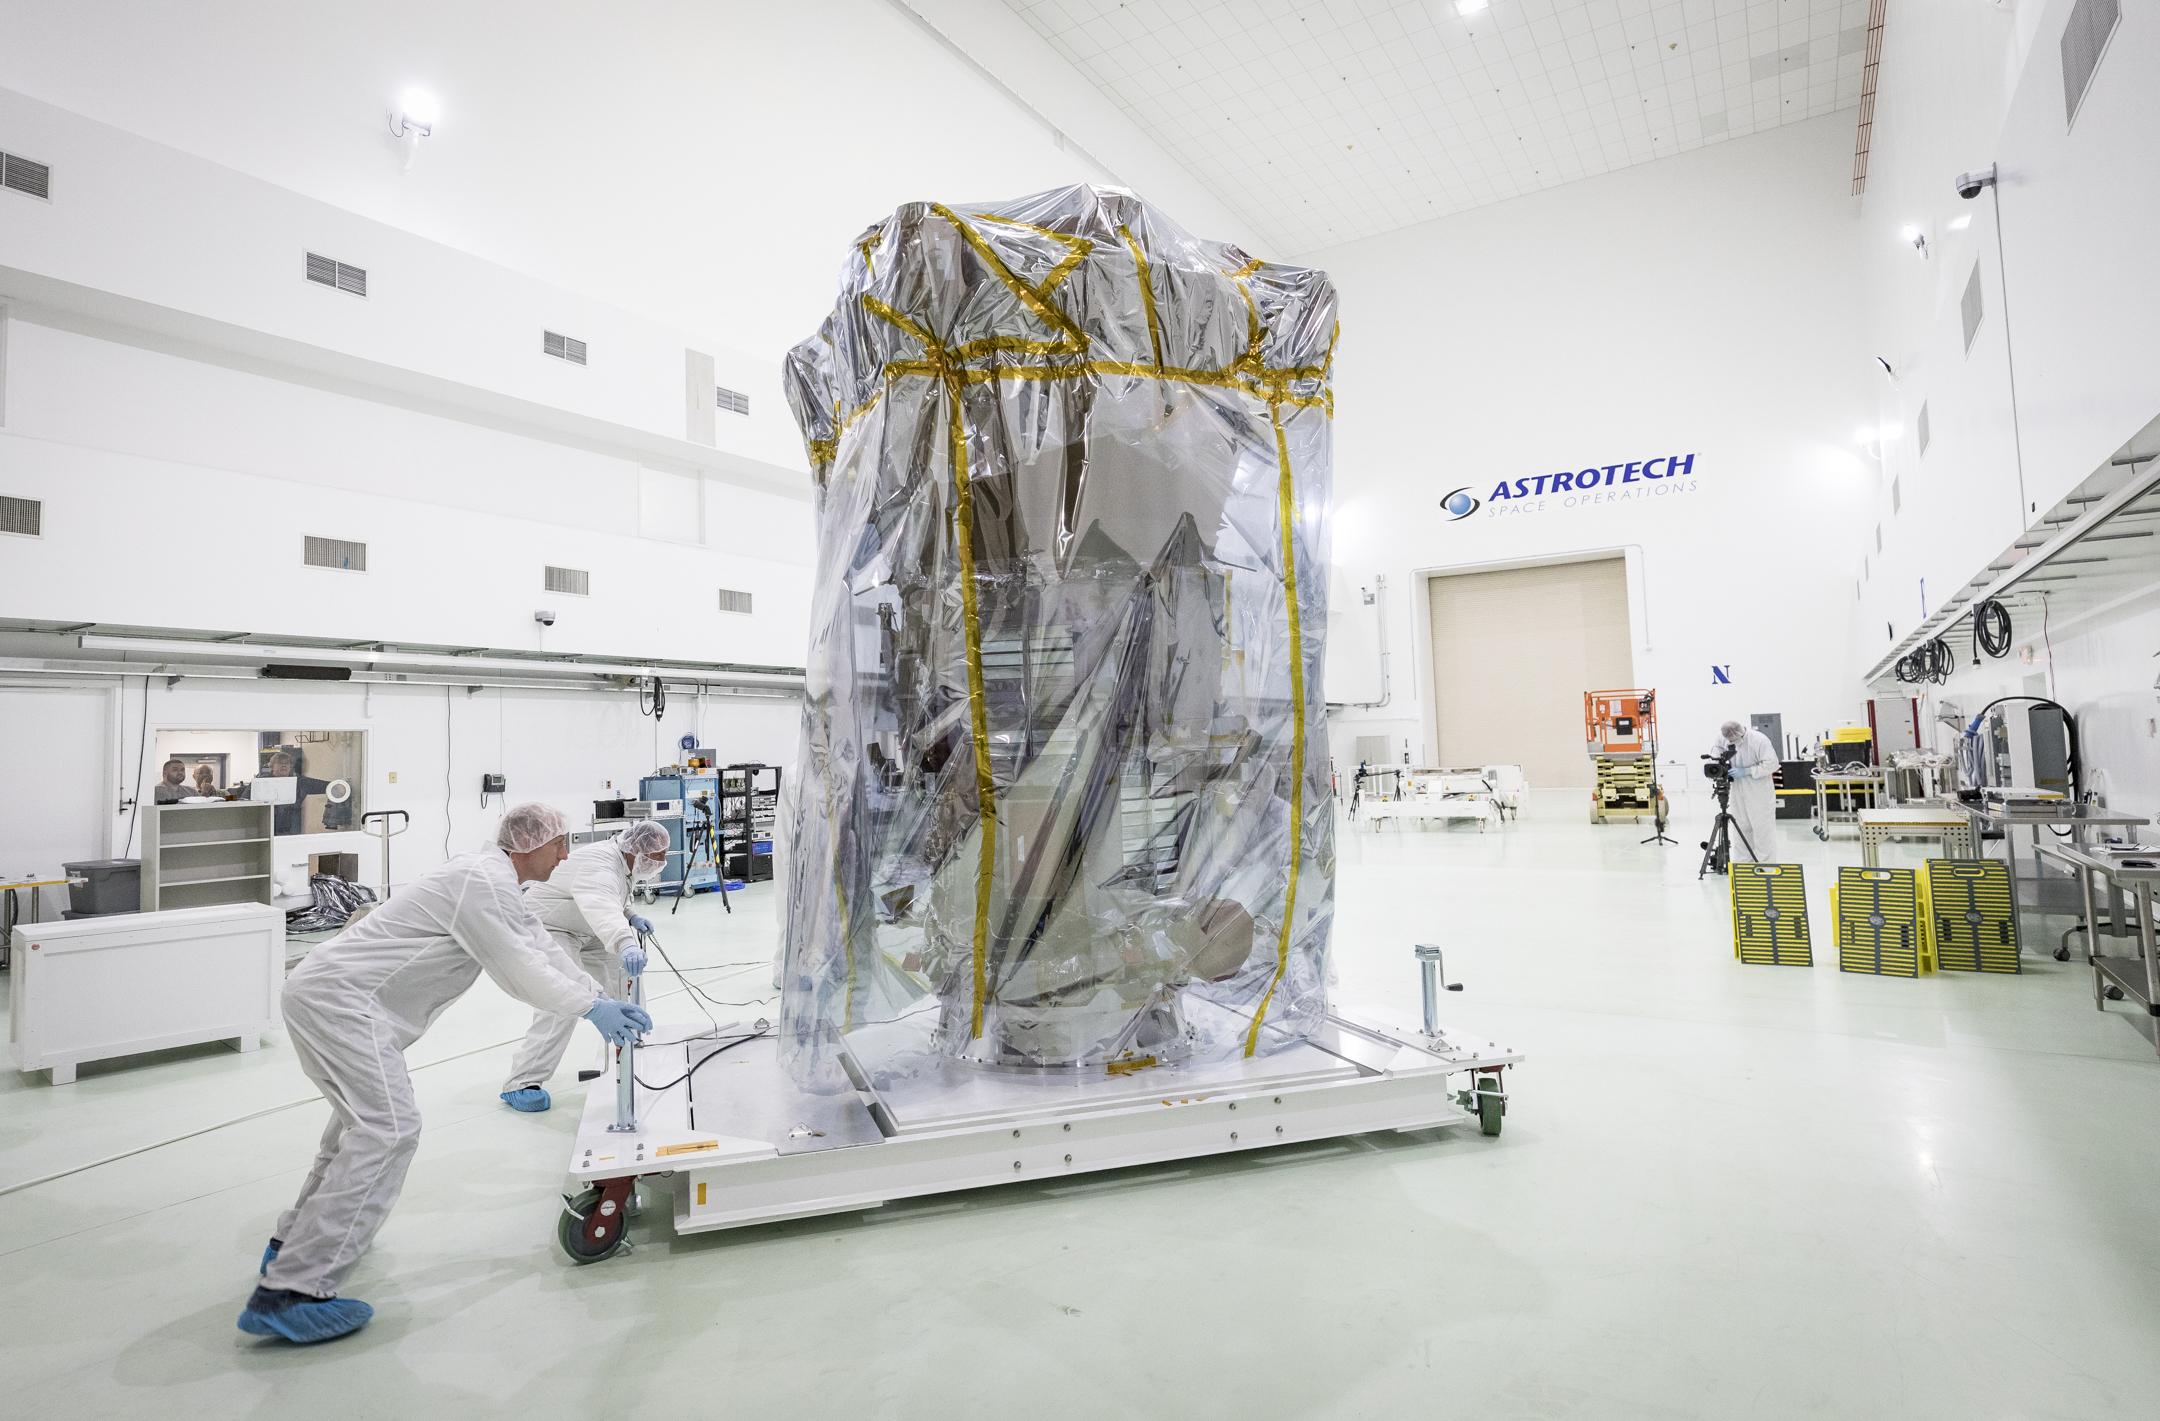 Delta-4 Heavy (Parker Solar Probe) - 12.8.2018 - Page 2 16